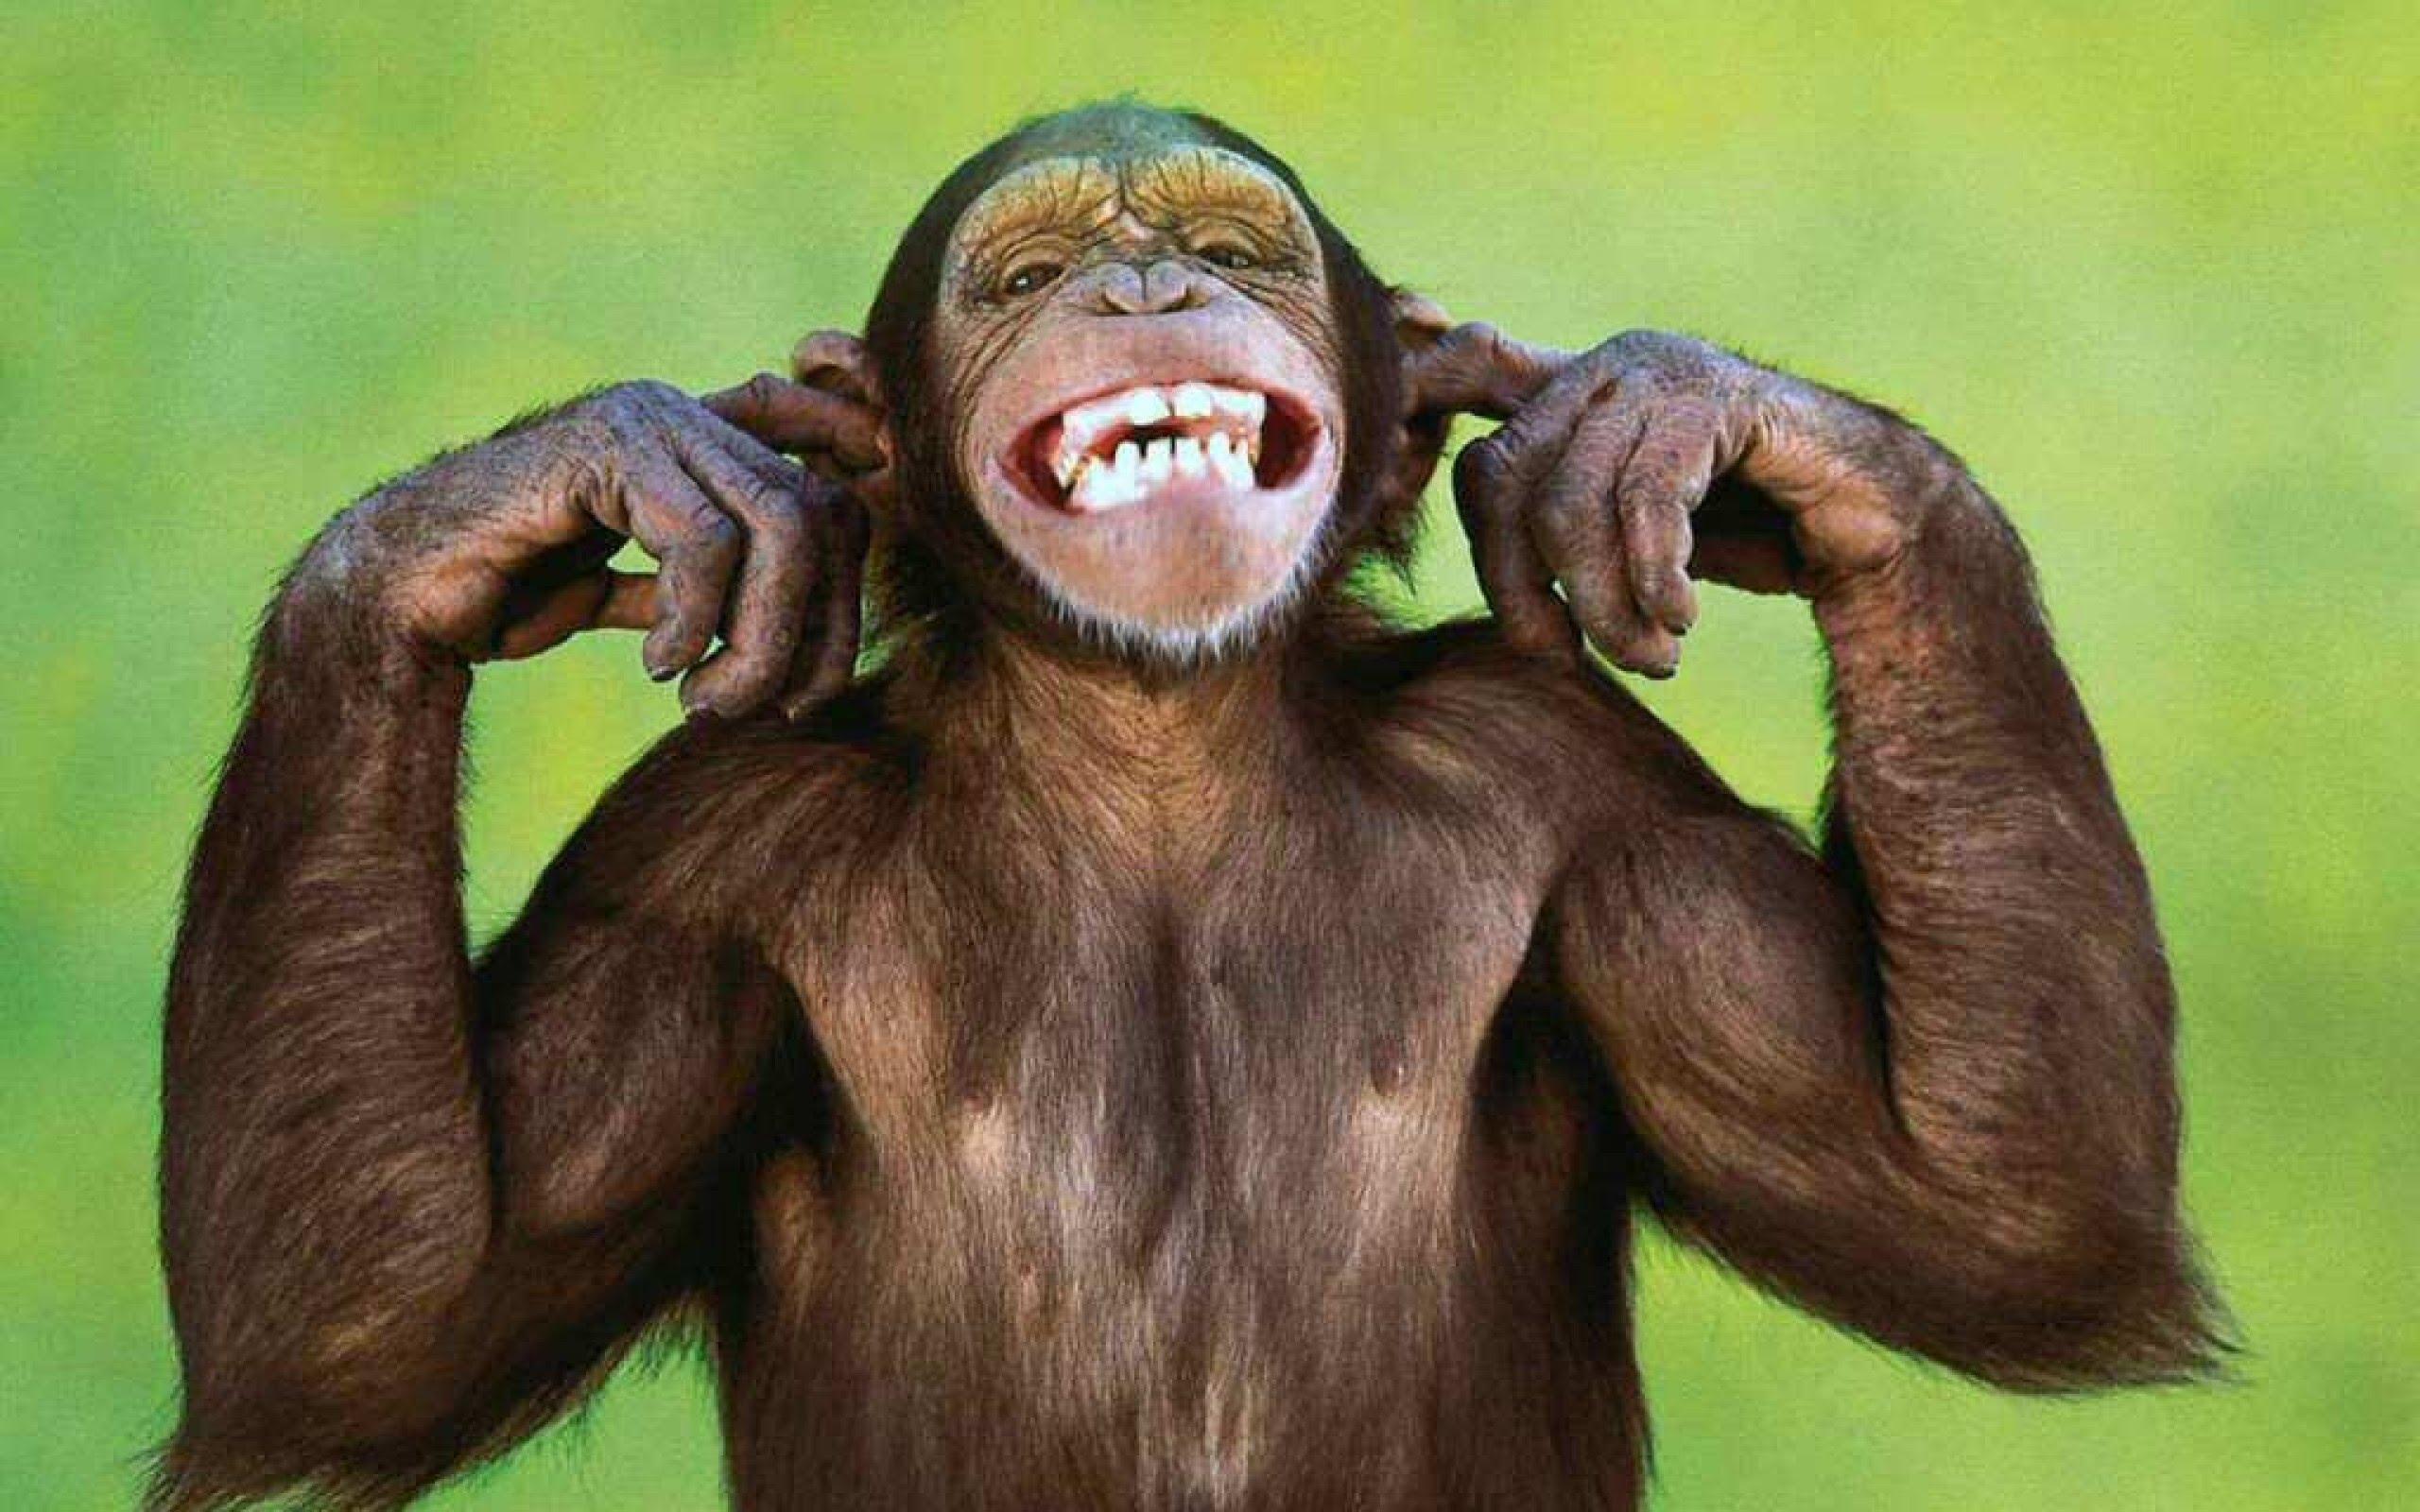 #Somos los gorilas hu hu hu